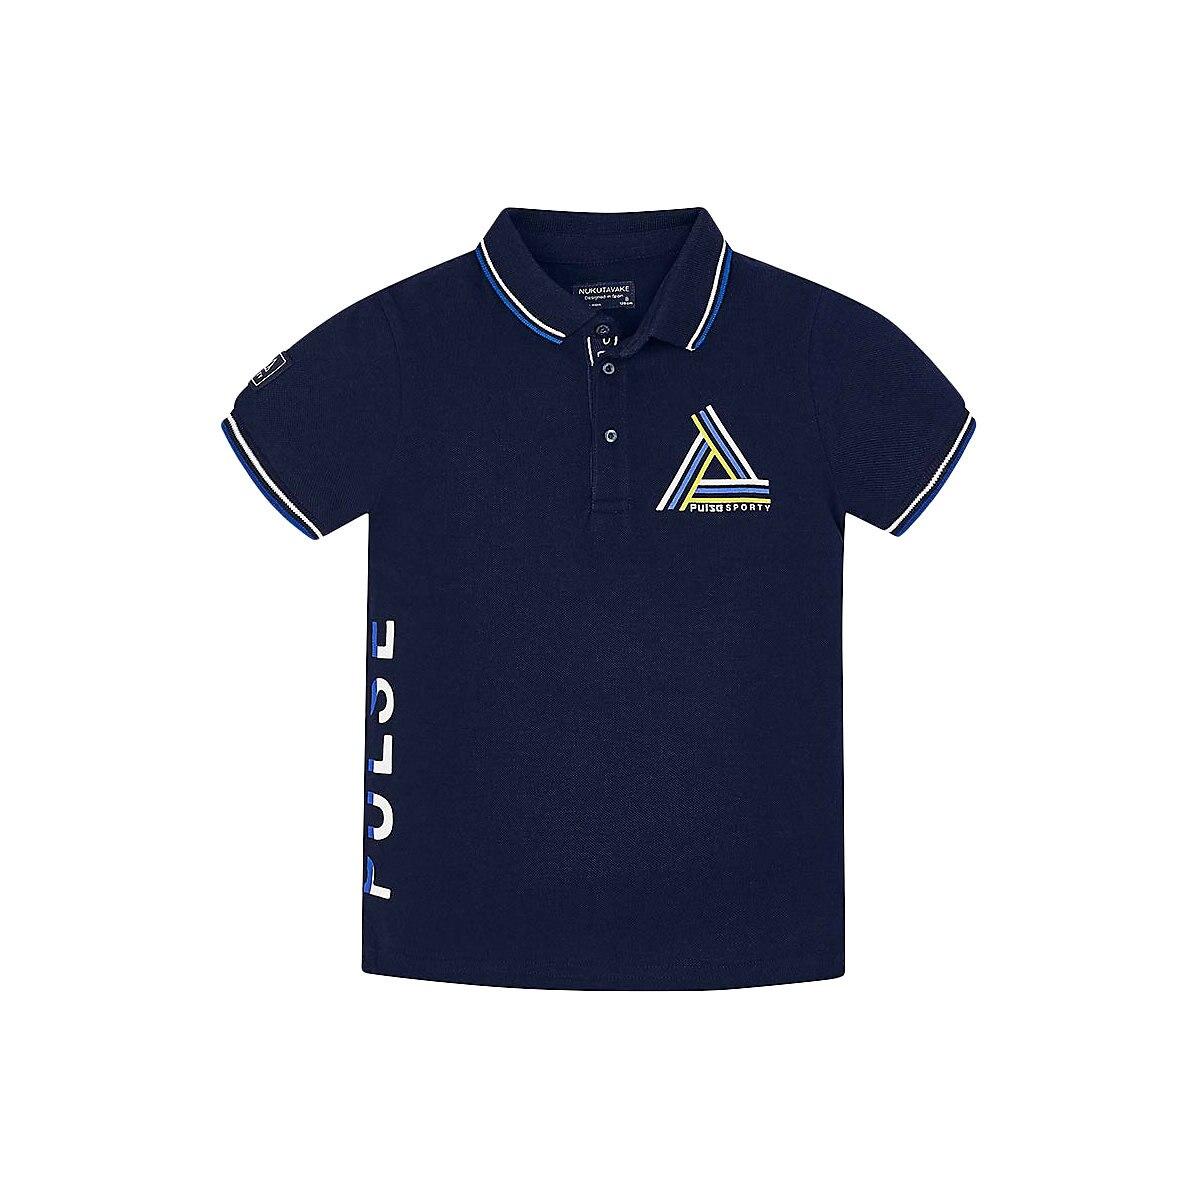 MAYORAL Polo Shirts 10689191 Children Clothing T-shirt Shirt The Print For Boys